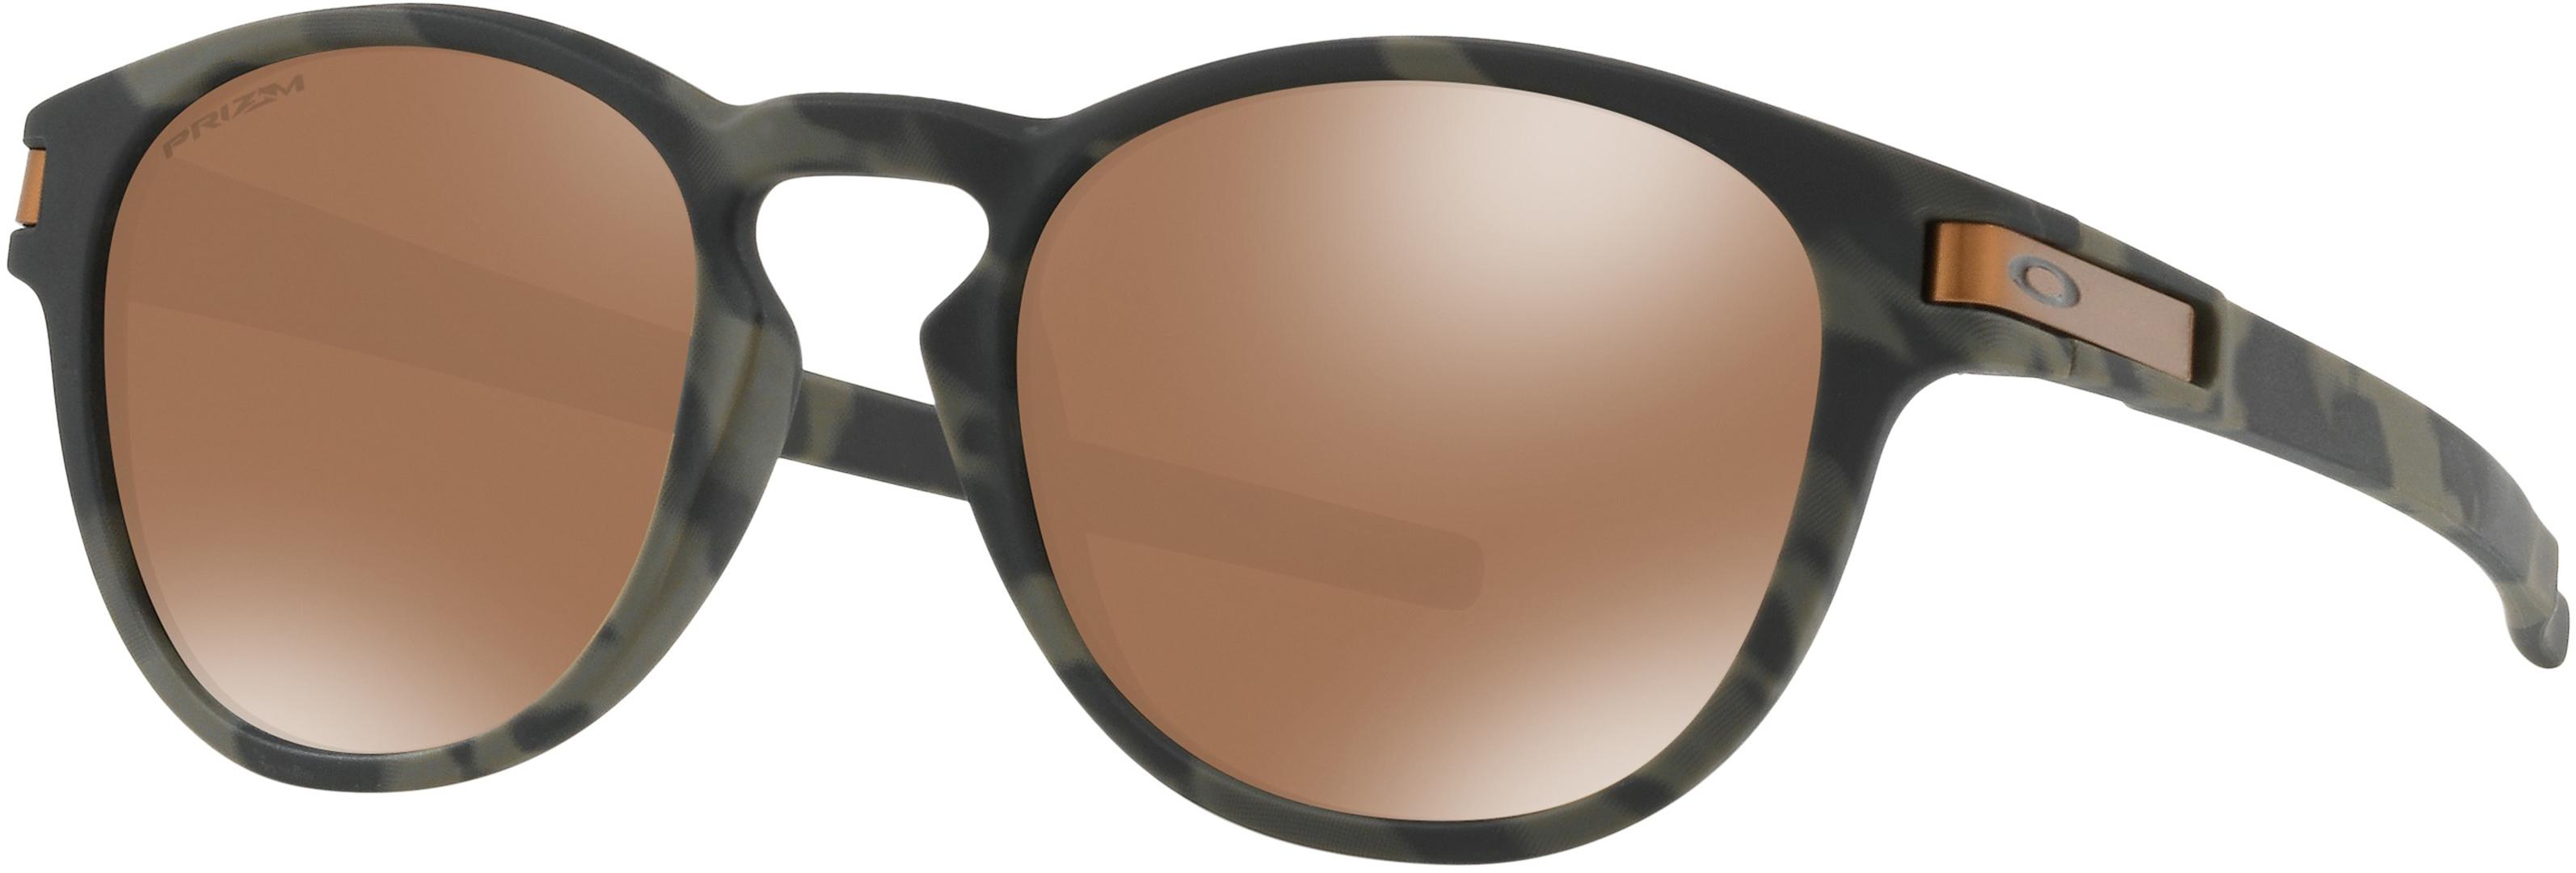 Oakley Sonnenbrille Latch Olive Camo/Prizm Tungsten vGoMW7H